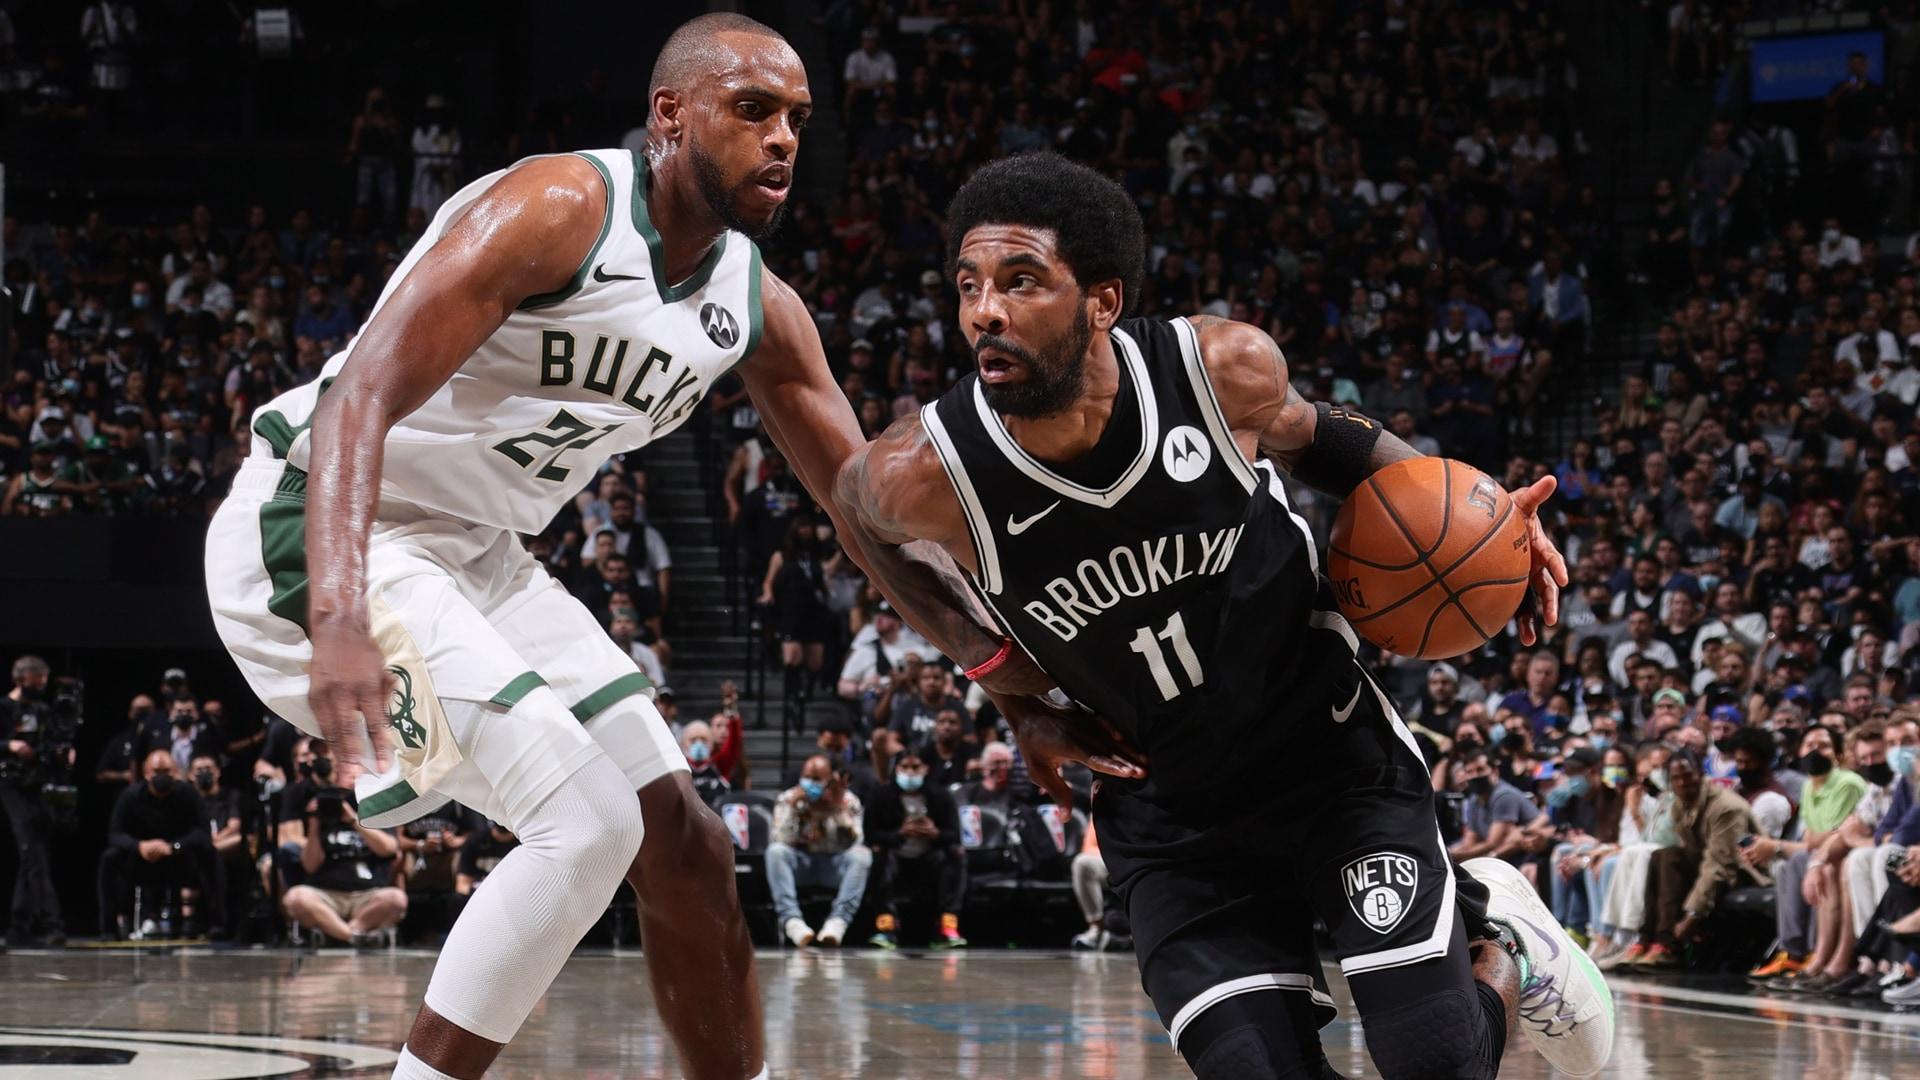 Game 1 Recap: Nets 115, Bucks 107